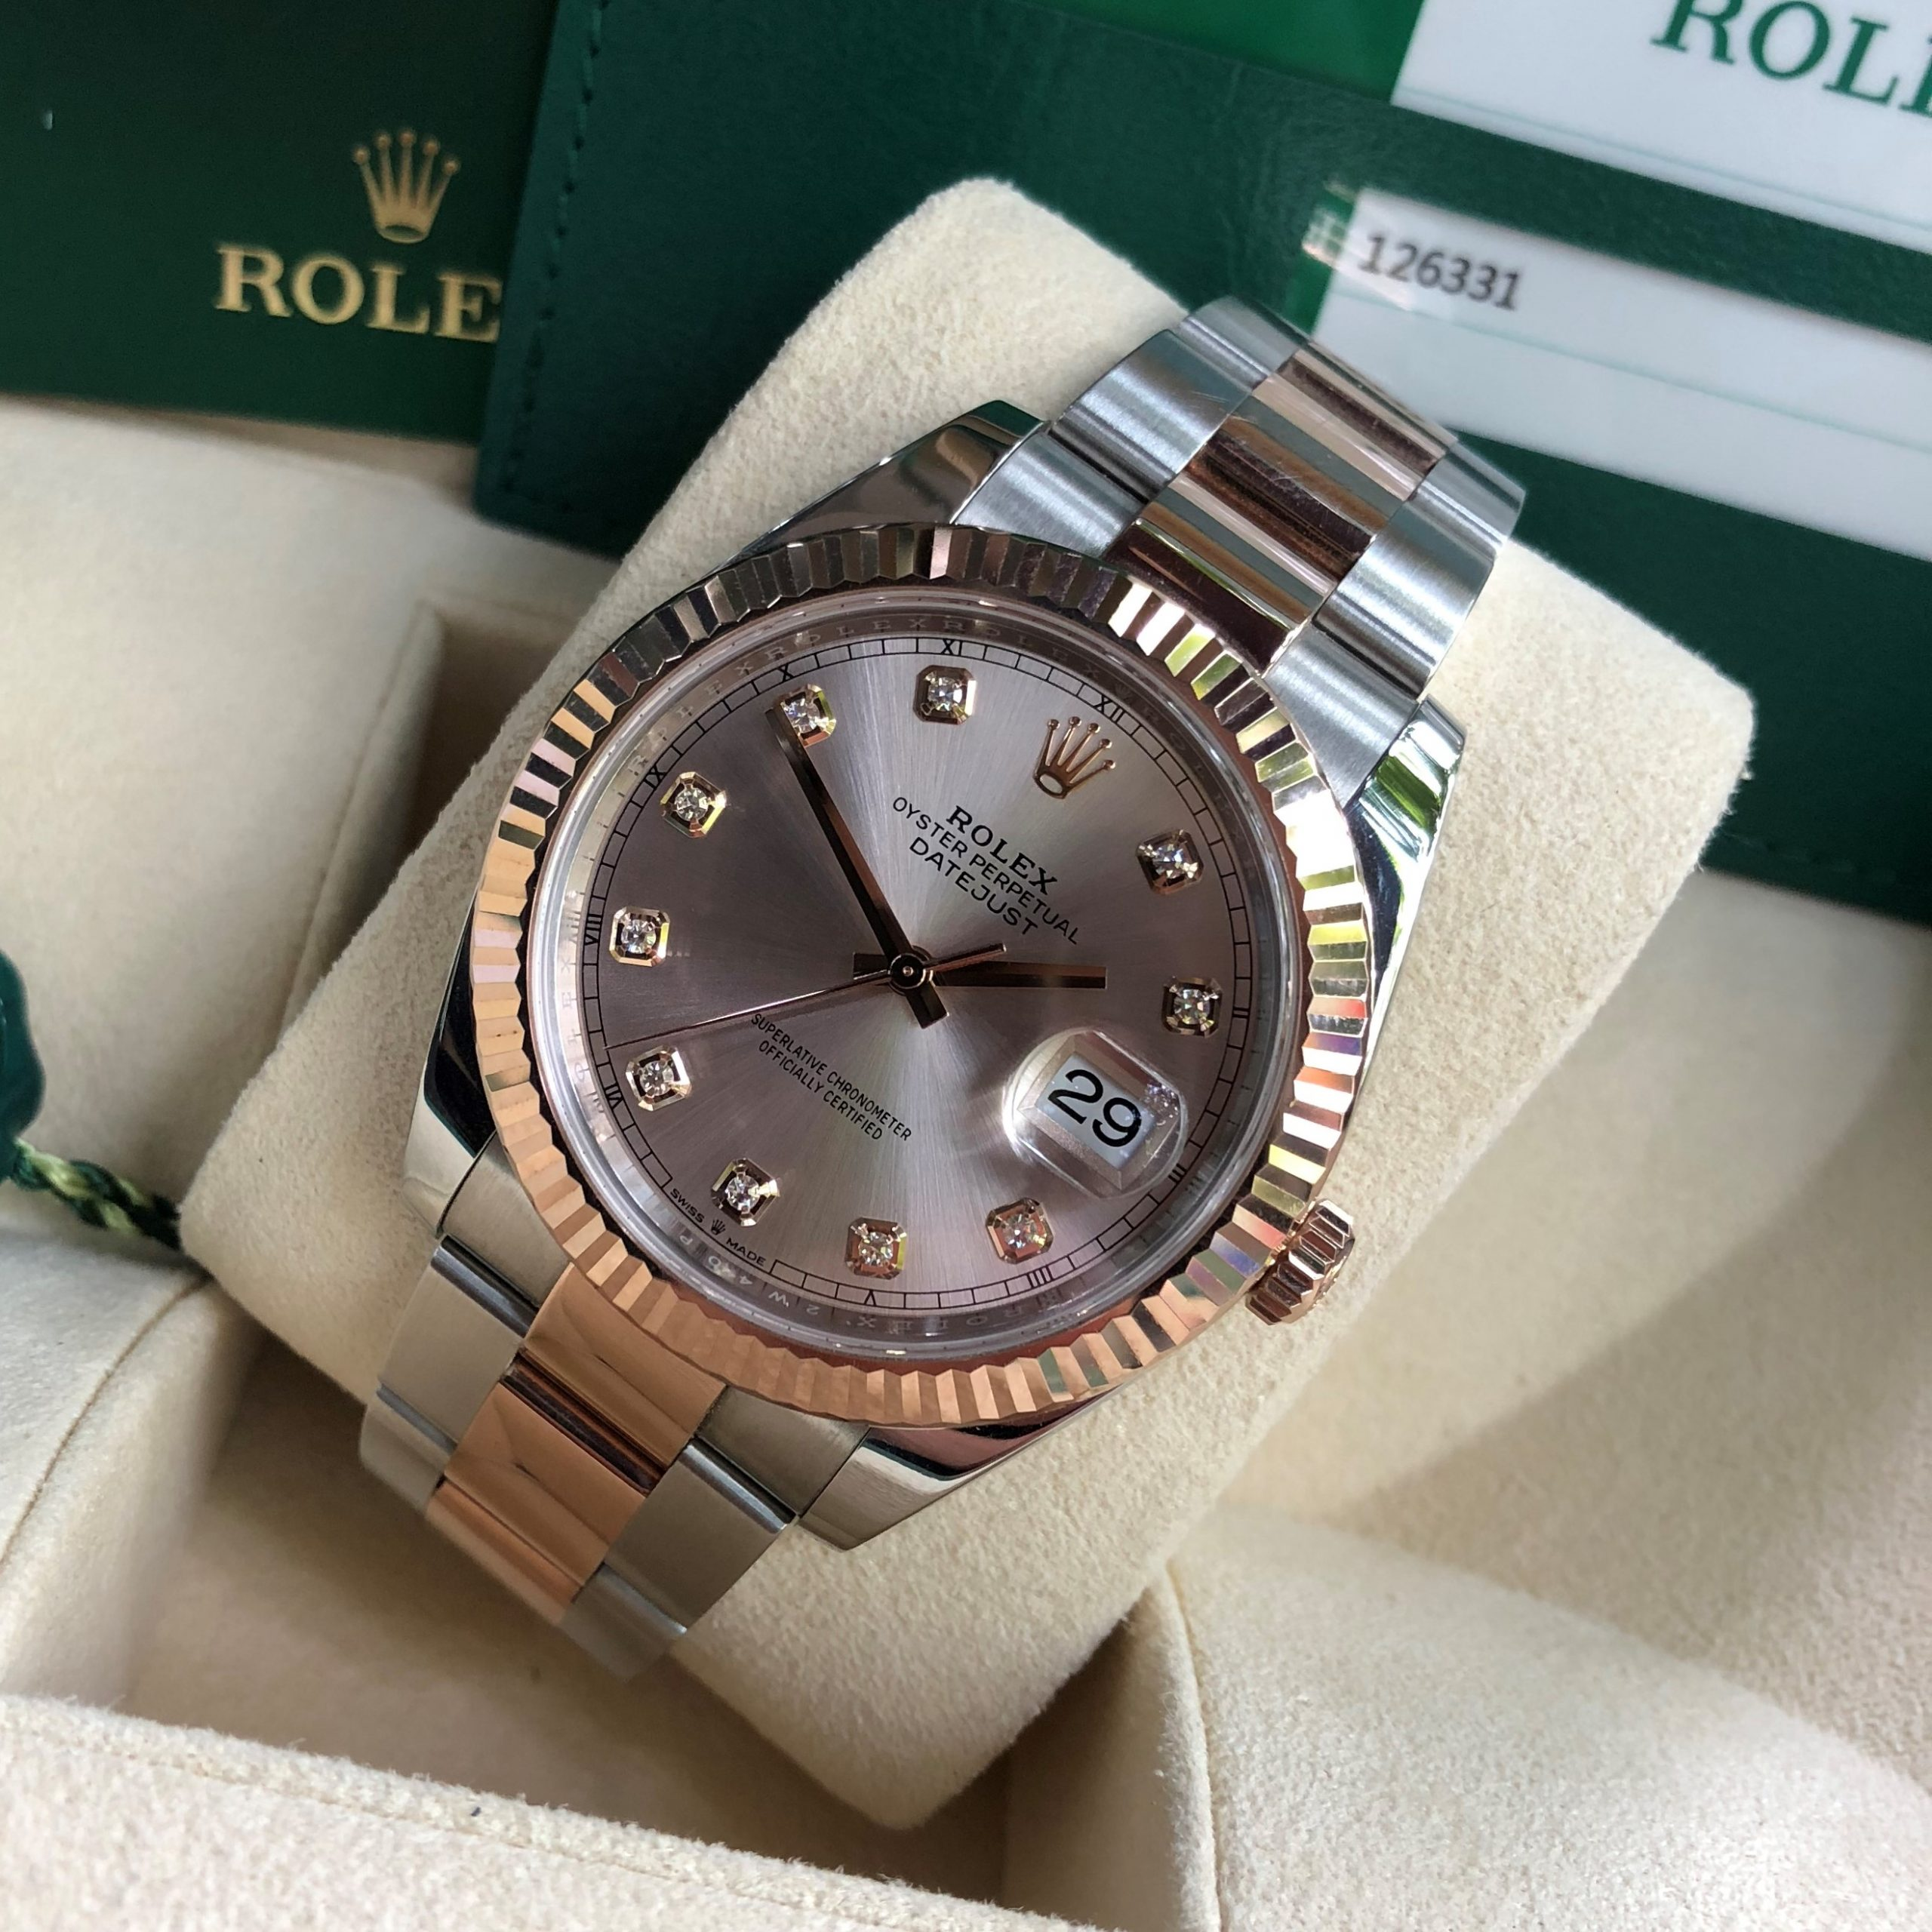 Rolex Datejust 126331 demi vàng hồng 18k cọc số kim cương Fullbox 2019